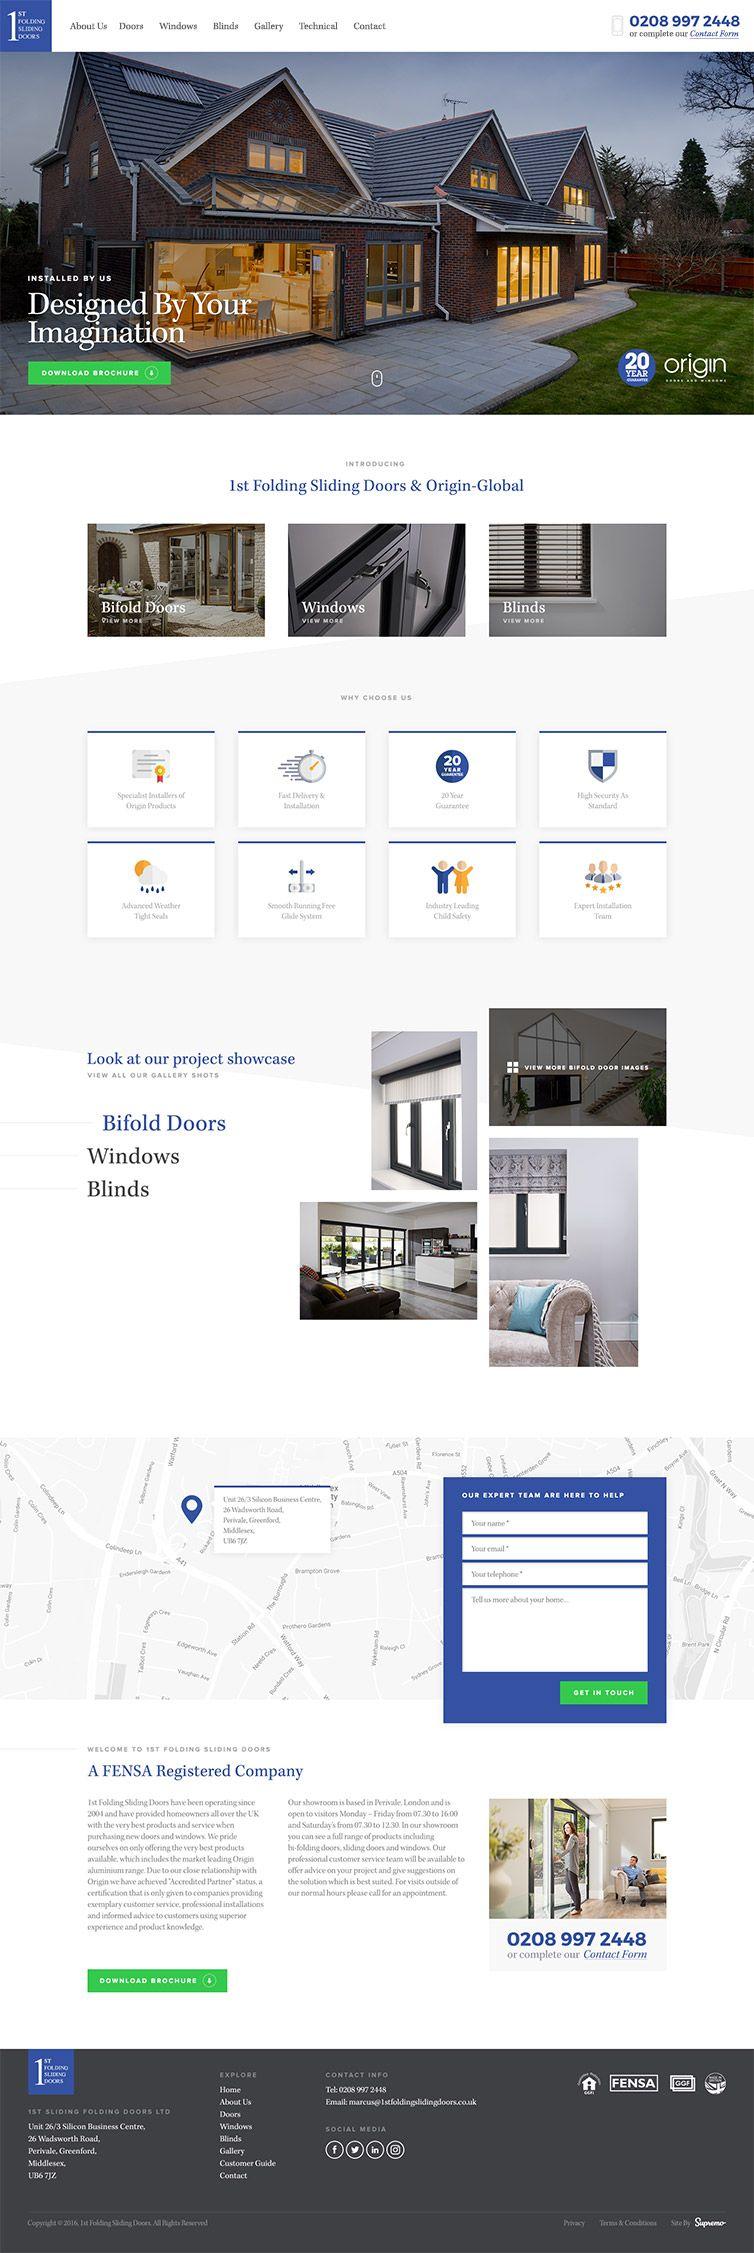 Pin On Sitios Web